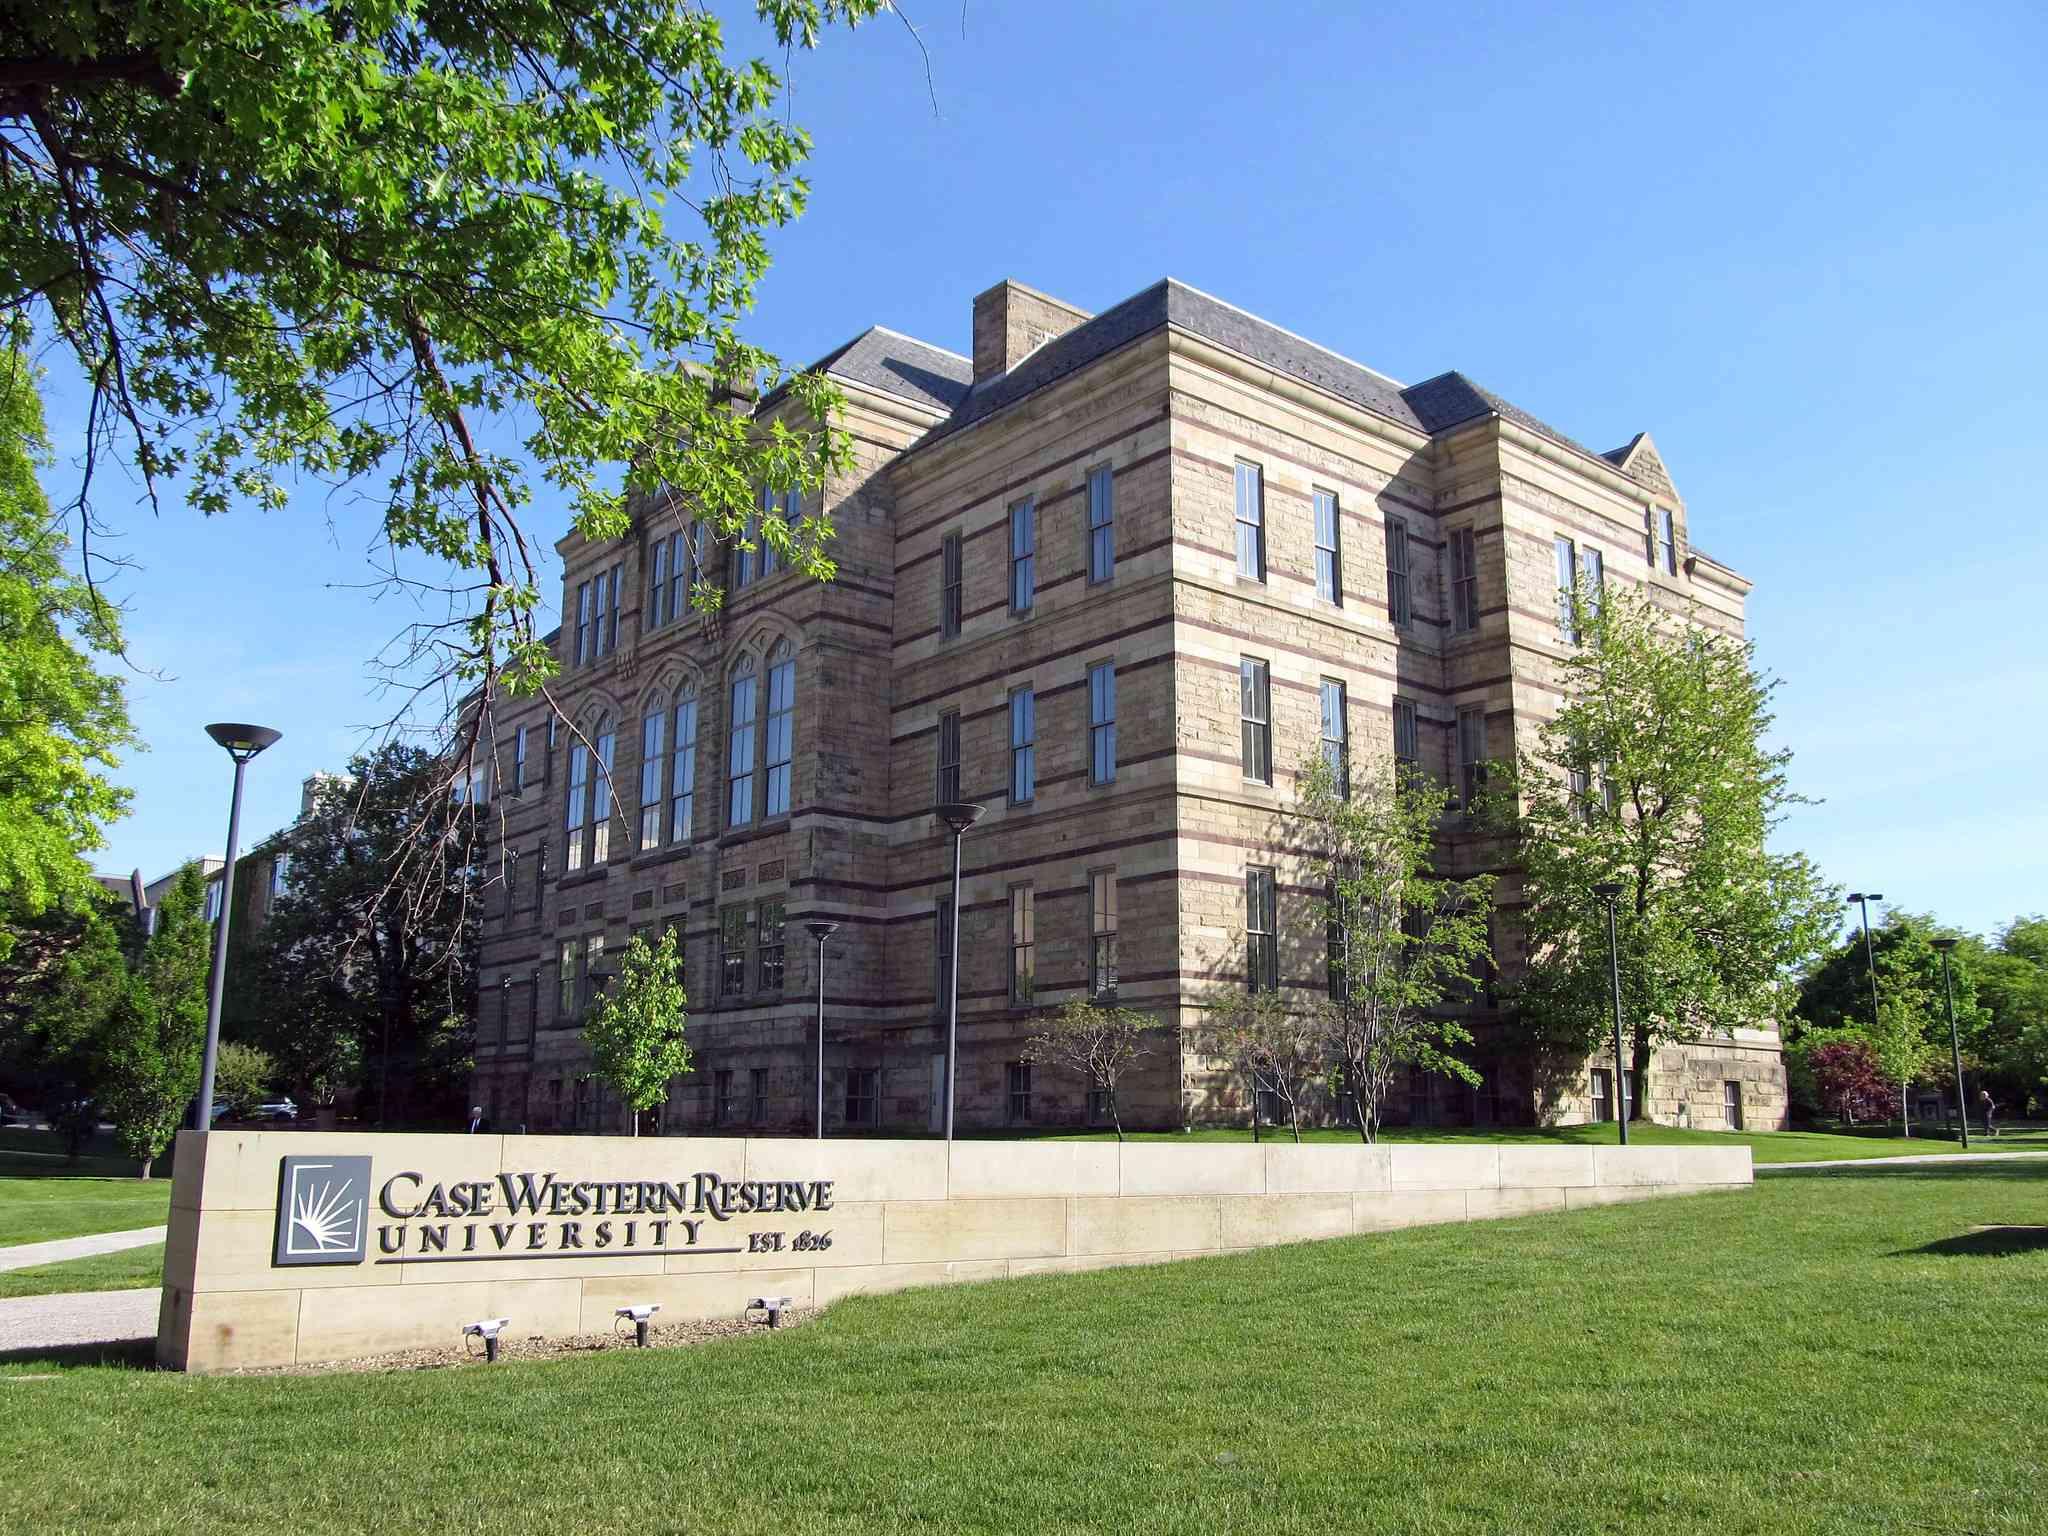 Best Public Interest Law Schools in the U.S.